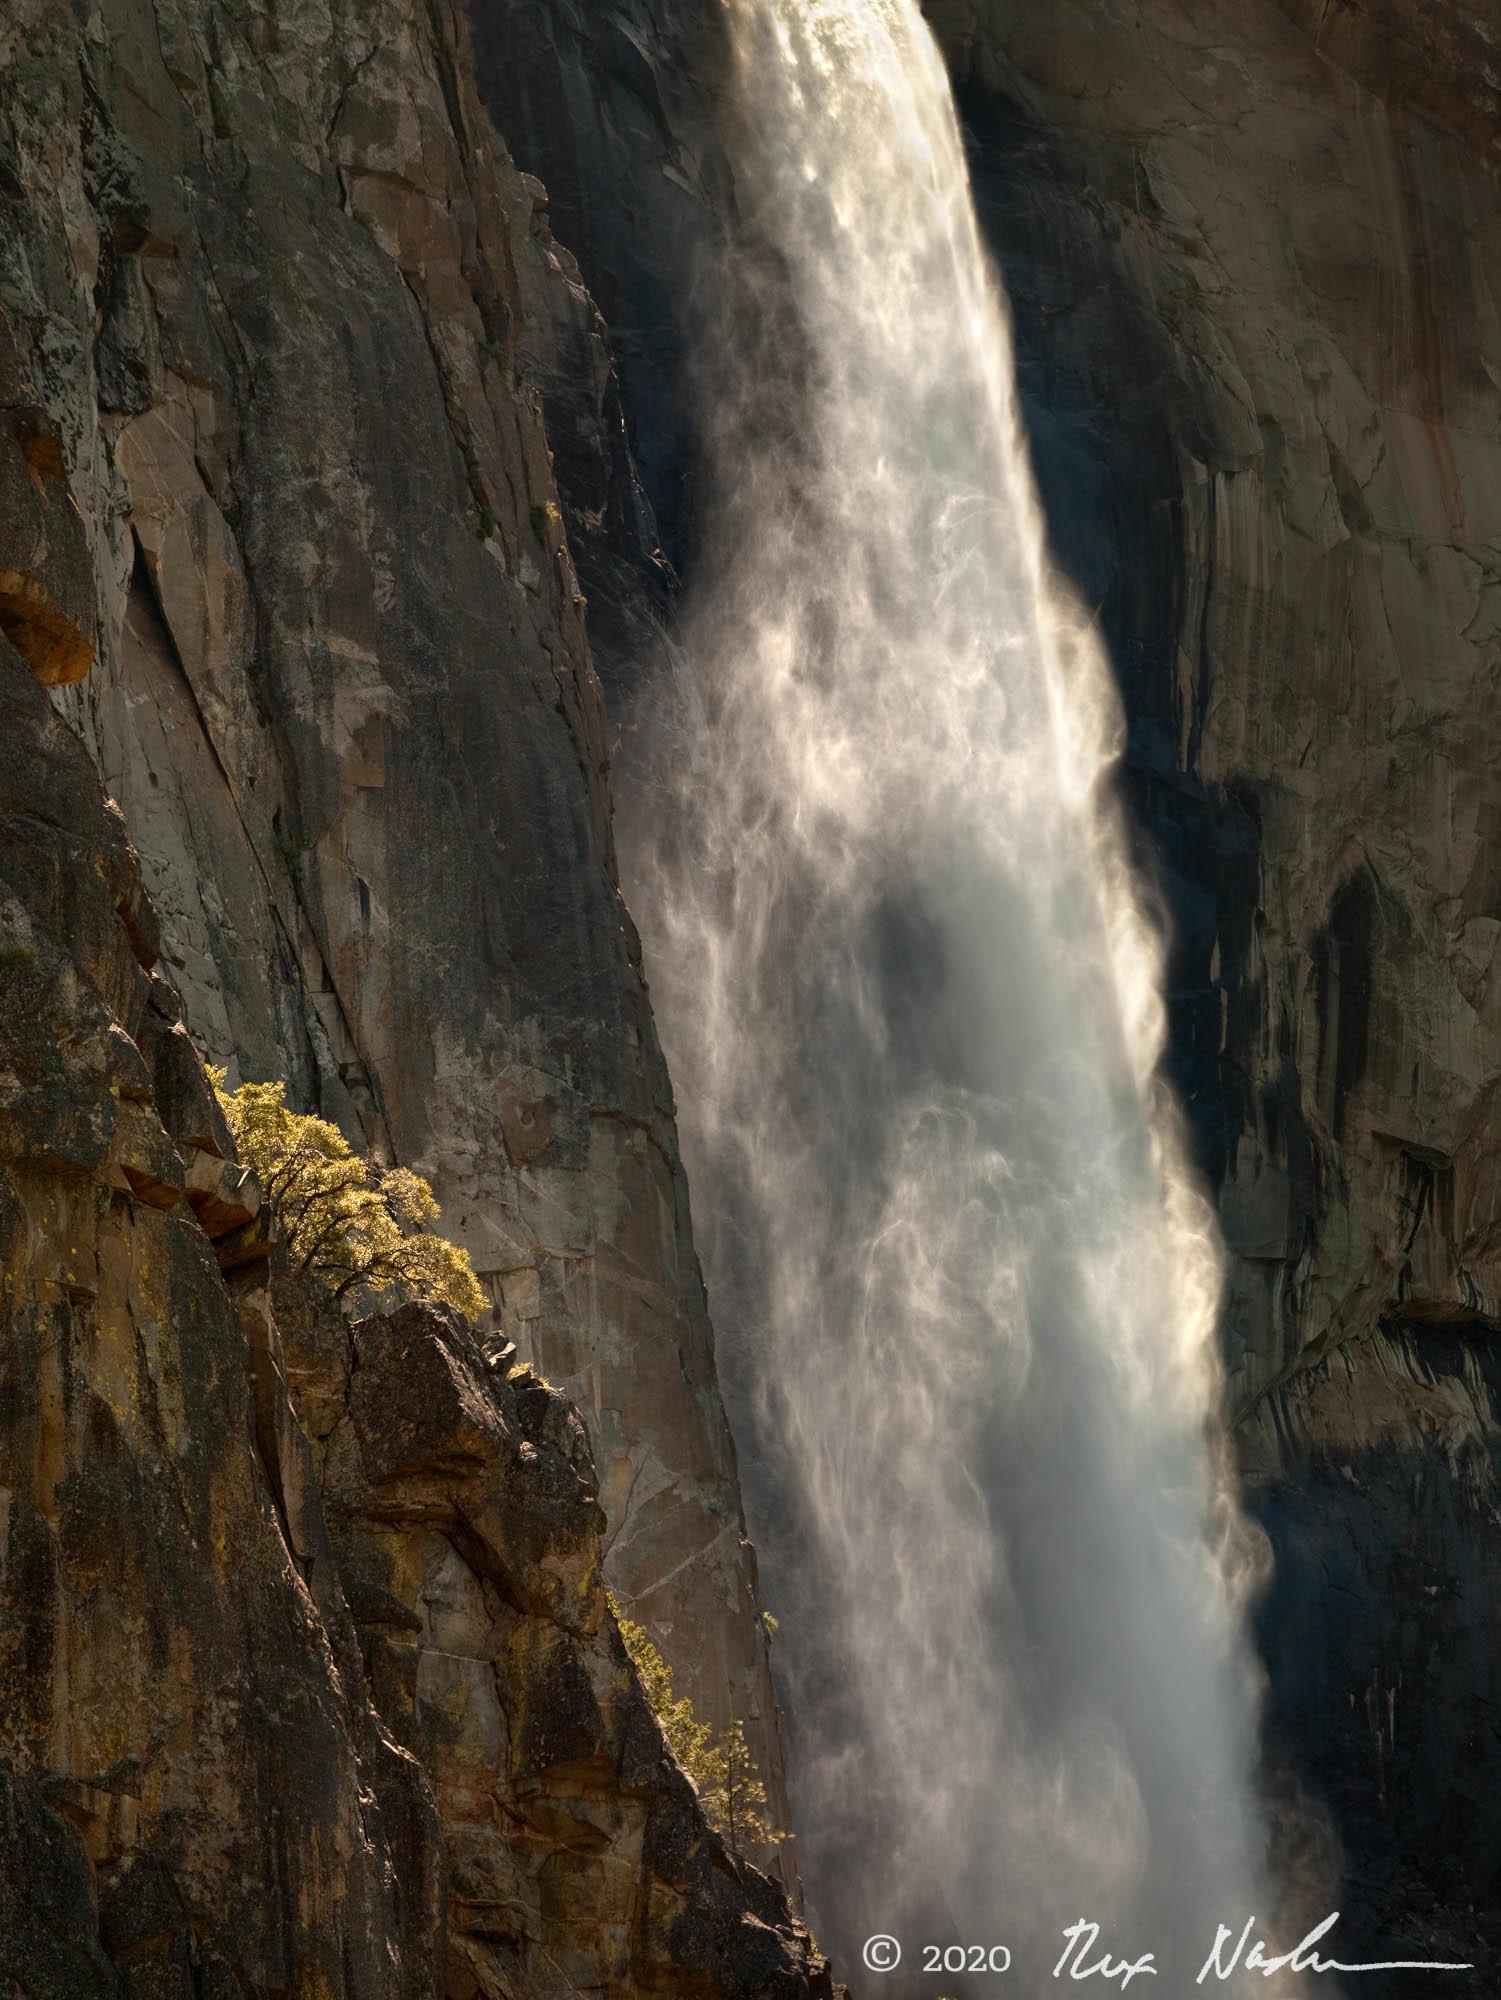 Vertiginous - Near Bridalveil Falls, Yosemite